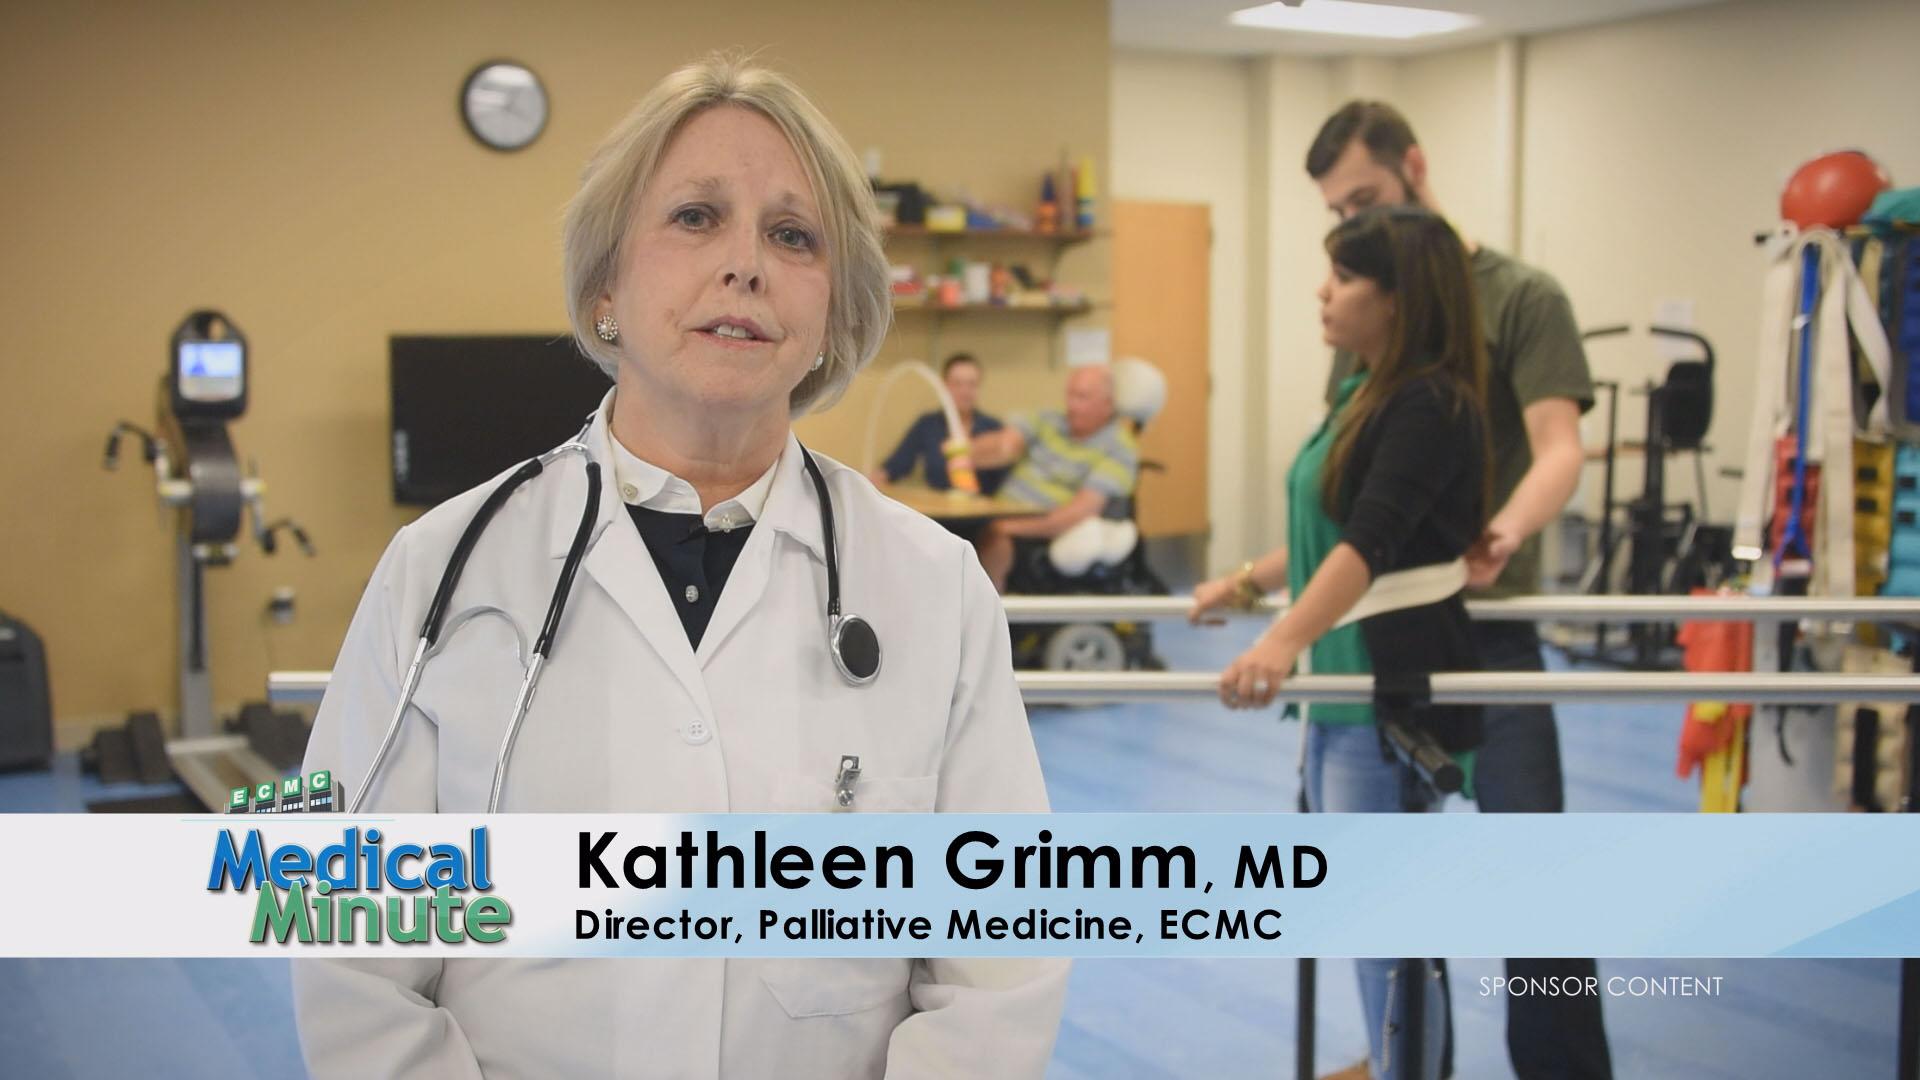 ECMC Medical Minute Dr.Grimm PalliativeCare 06.06.16 STILL